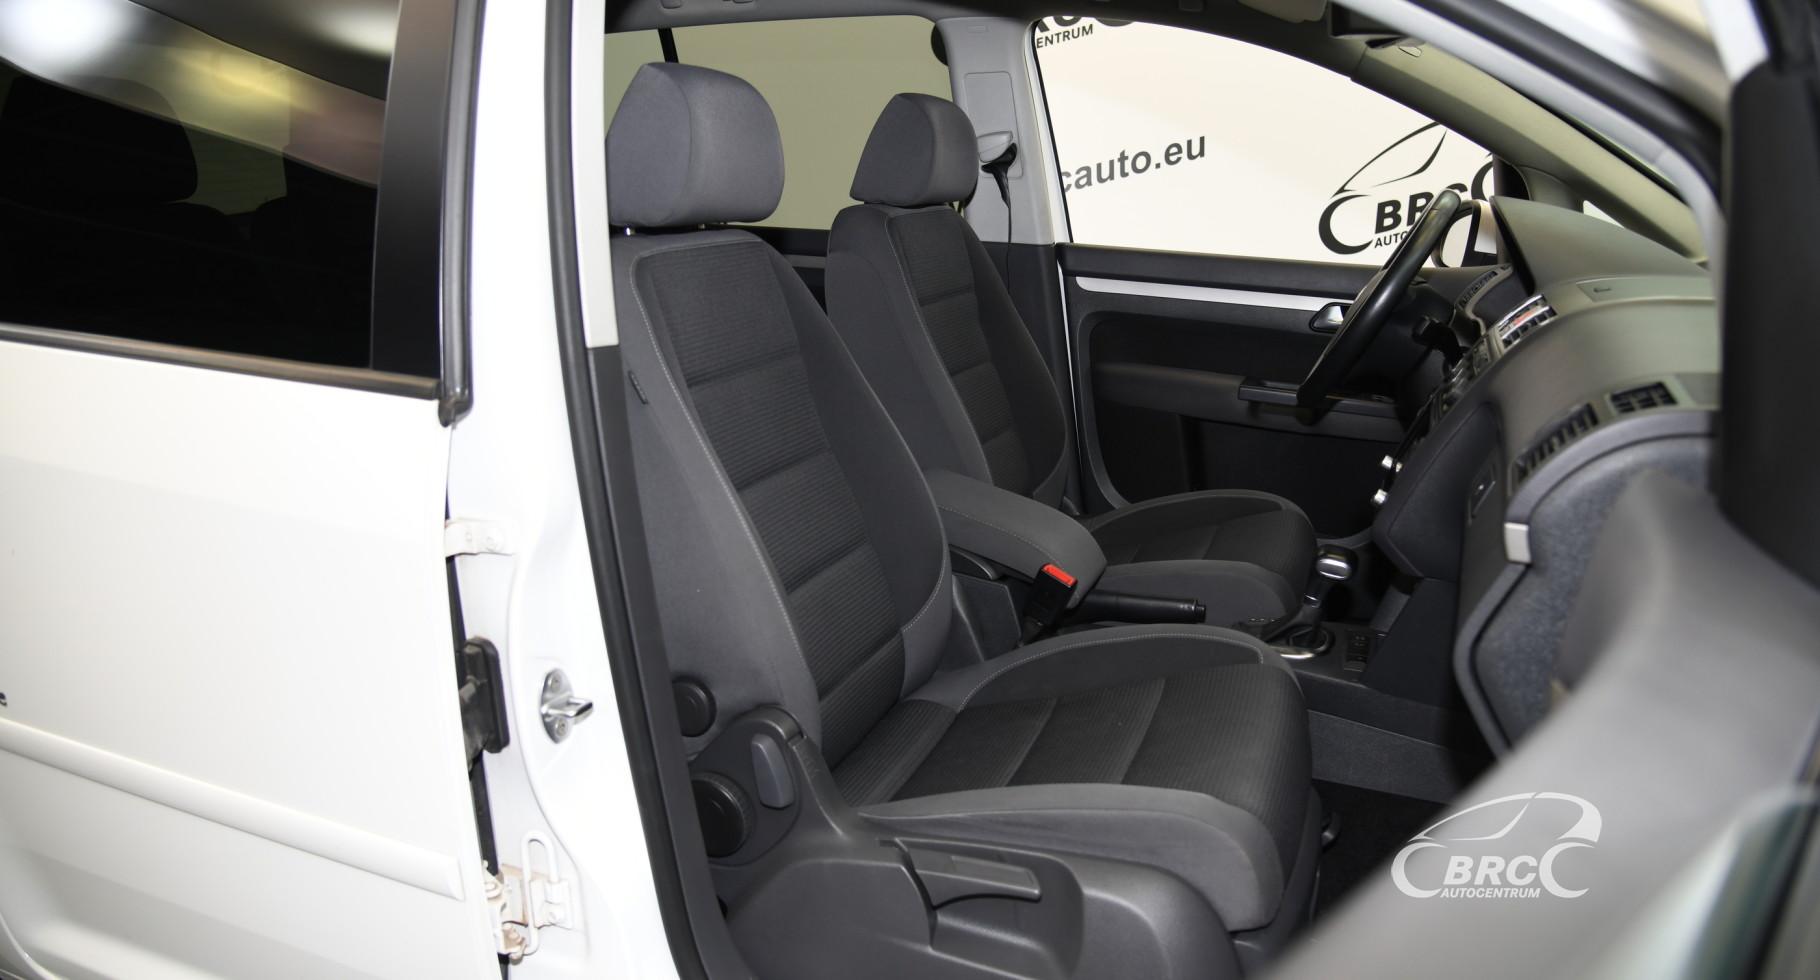 Volkswagen Touran 1.4 TSI Trend Automatas